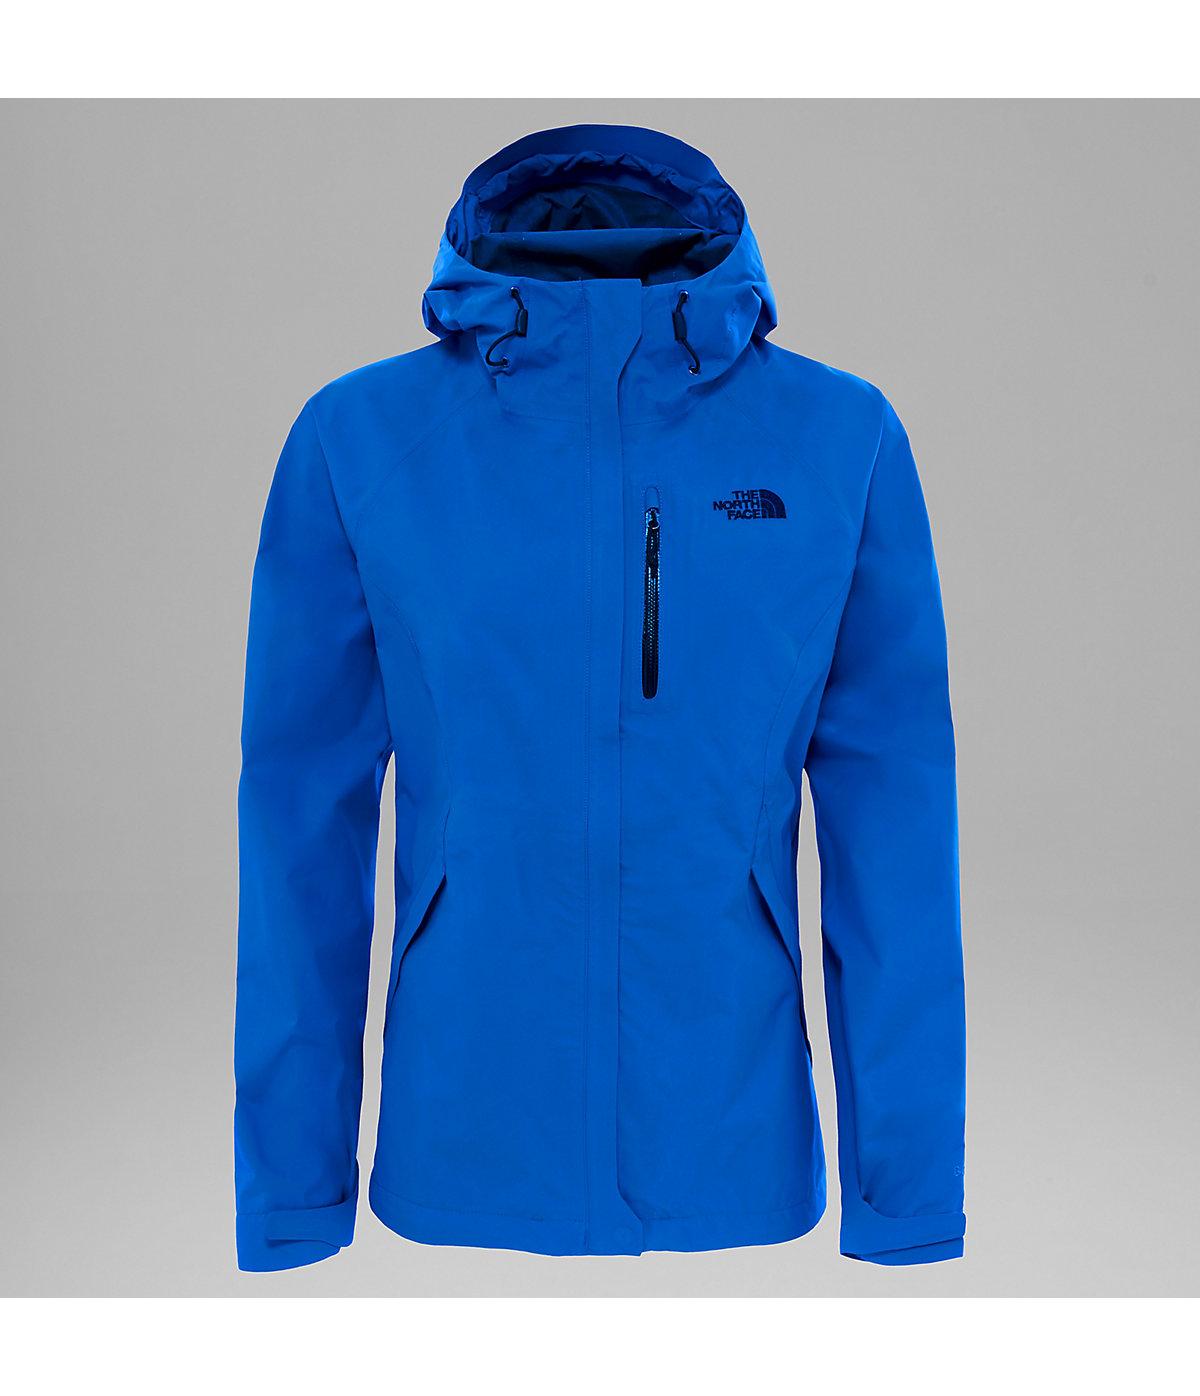 Куртка The North Face Dryzzle женская